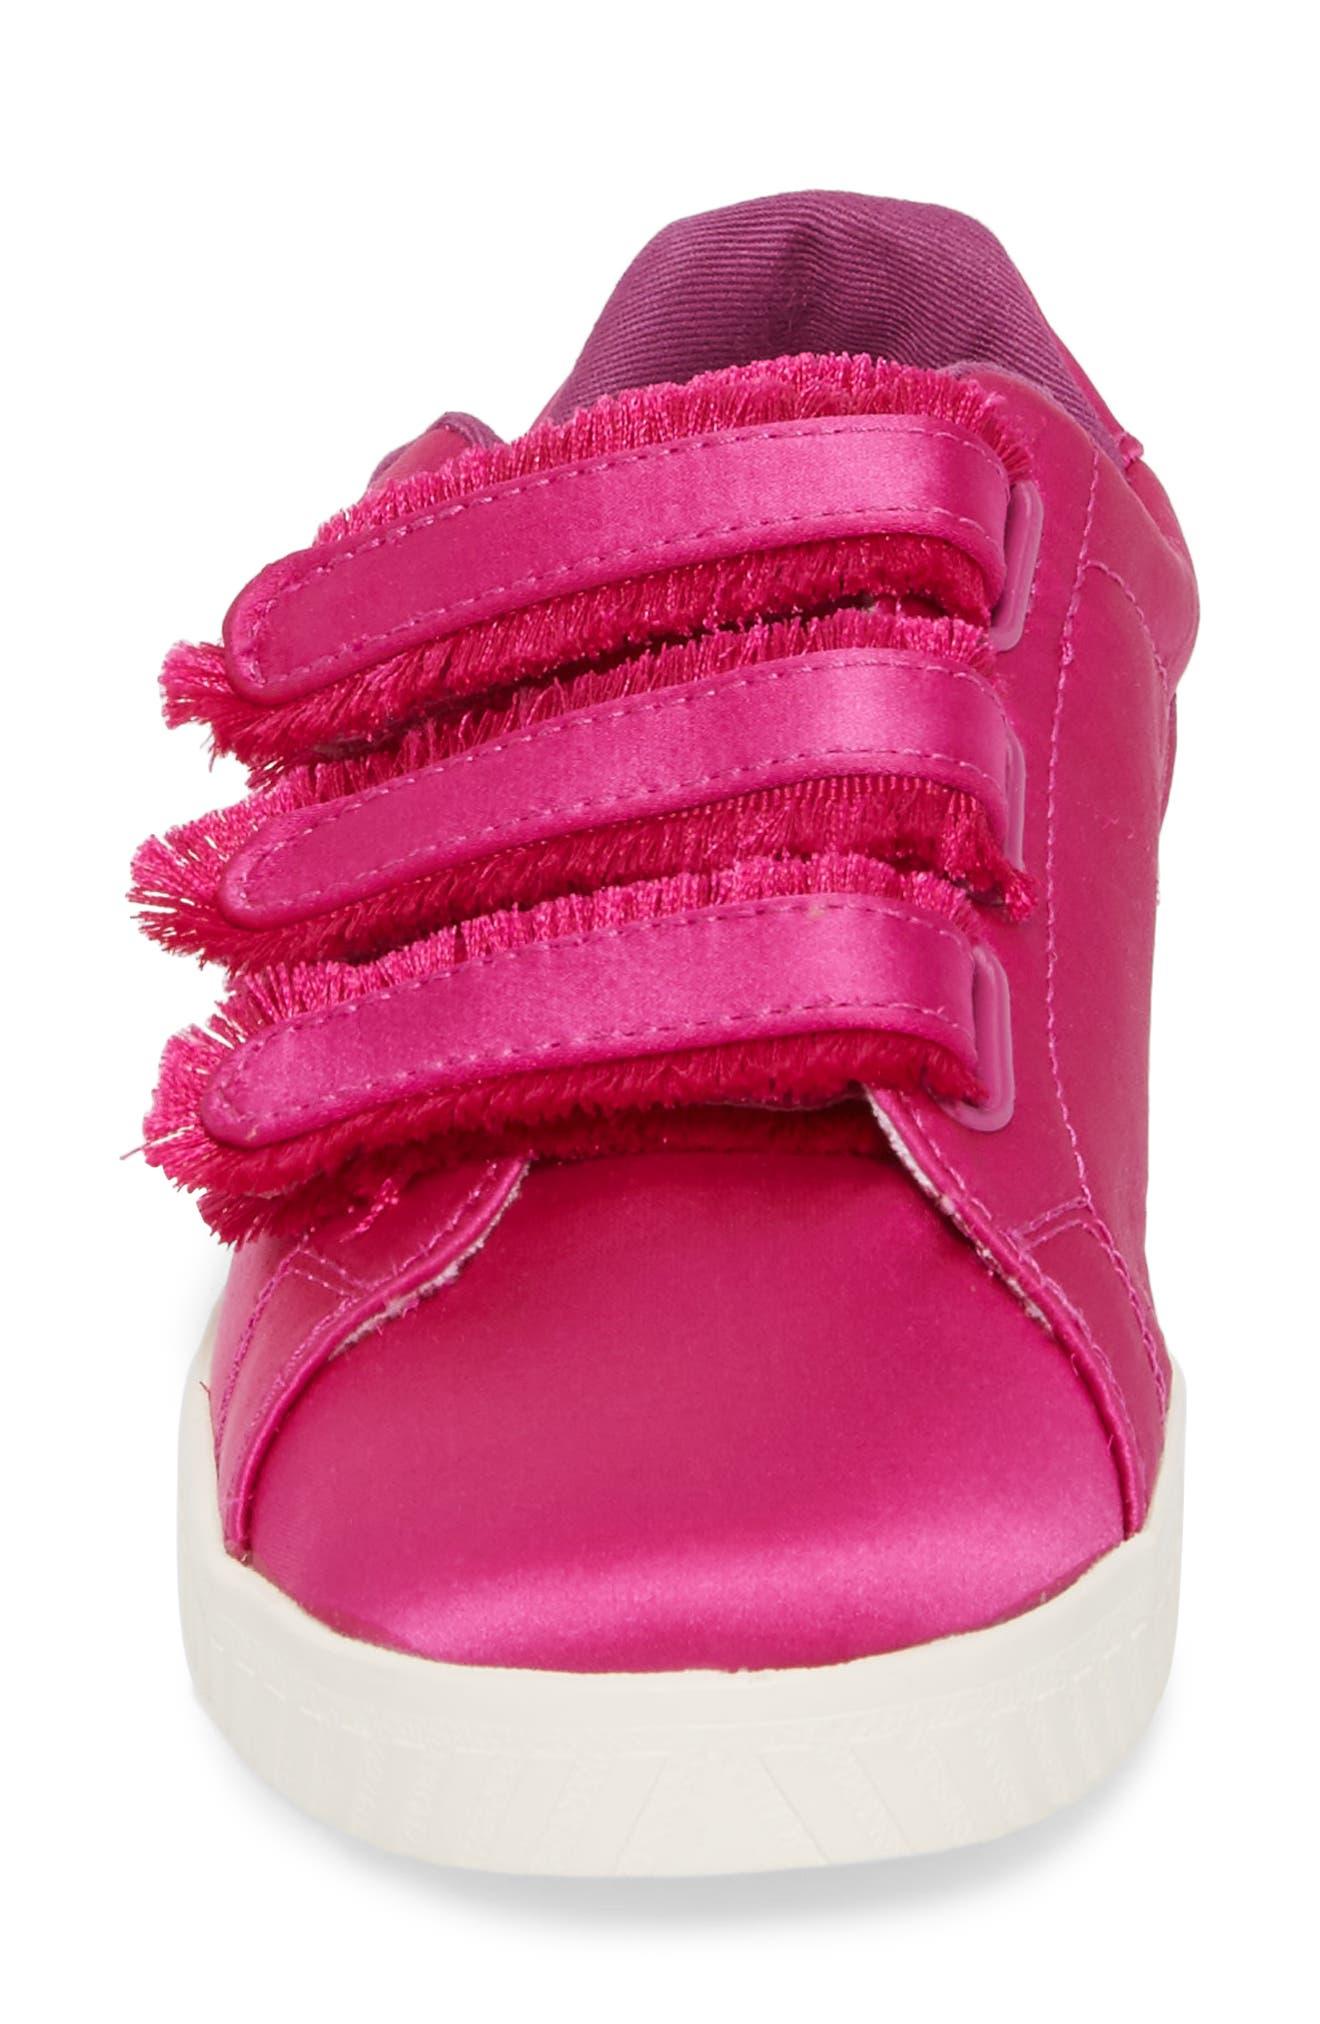 Fringed Strap Sneaker,                             Alternate thumbnail 4, color,                             FUCHSIA SATIN